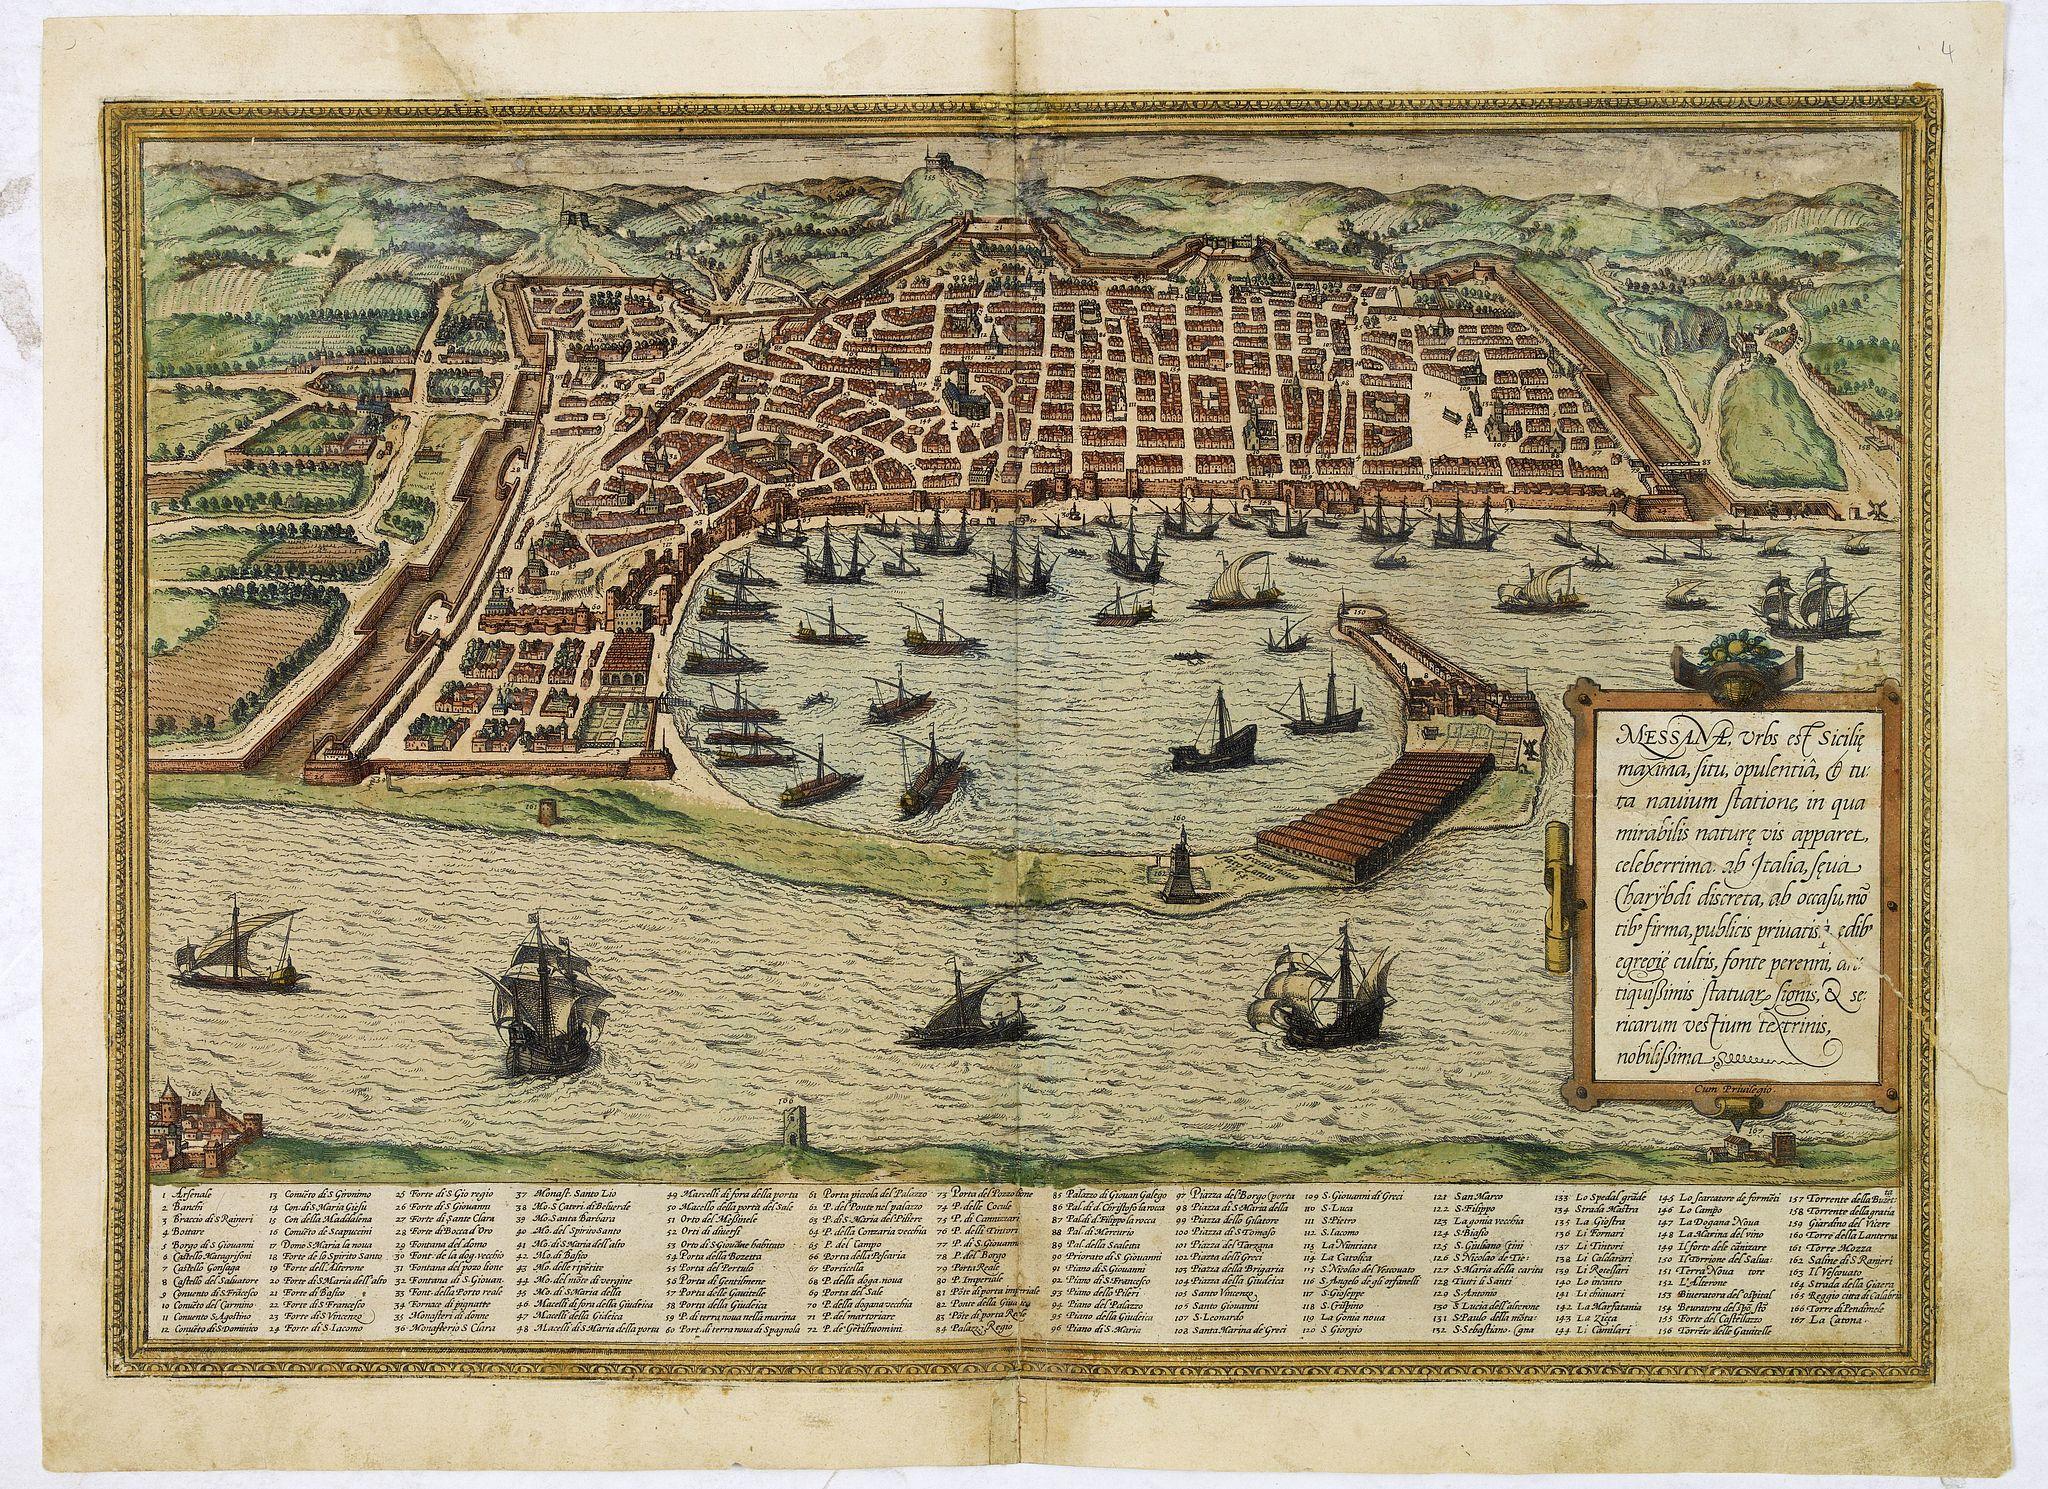 BRAUN,G. / HOGENBERG, F. -  Messana, Urbs est Sicilie maxima, situ, opulentia, & tuta navium statione.